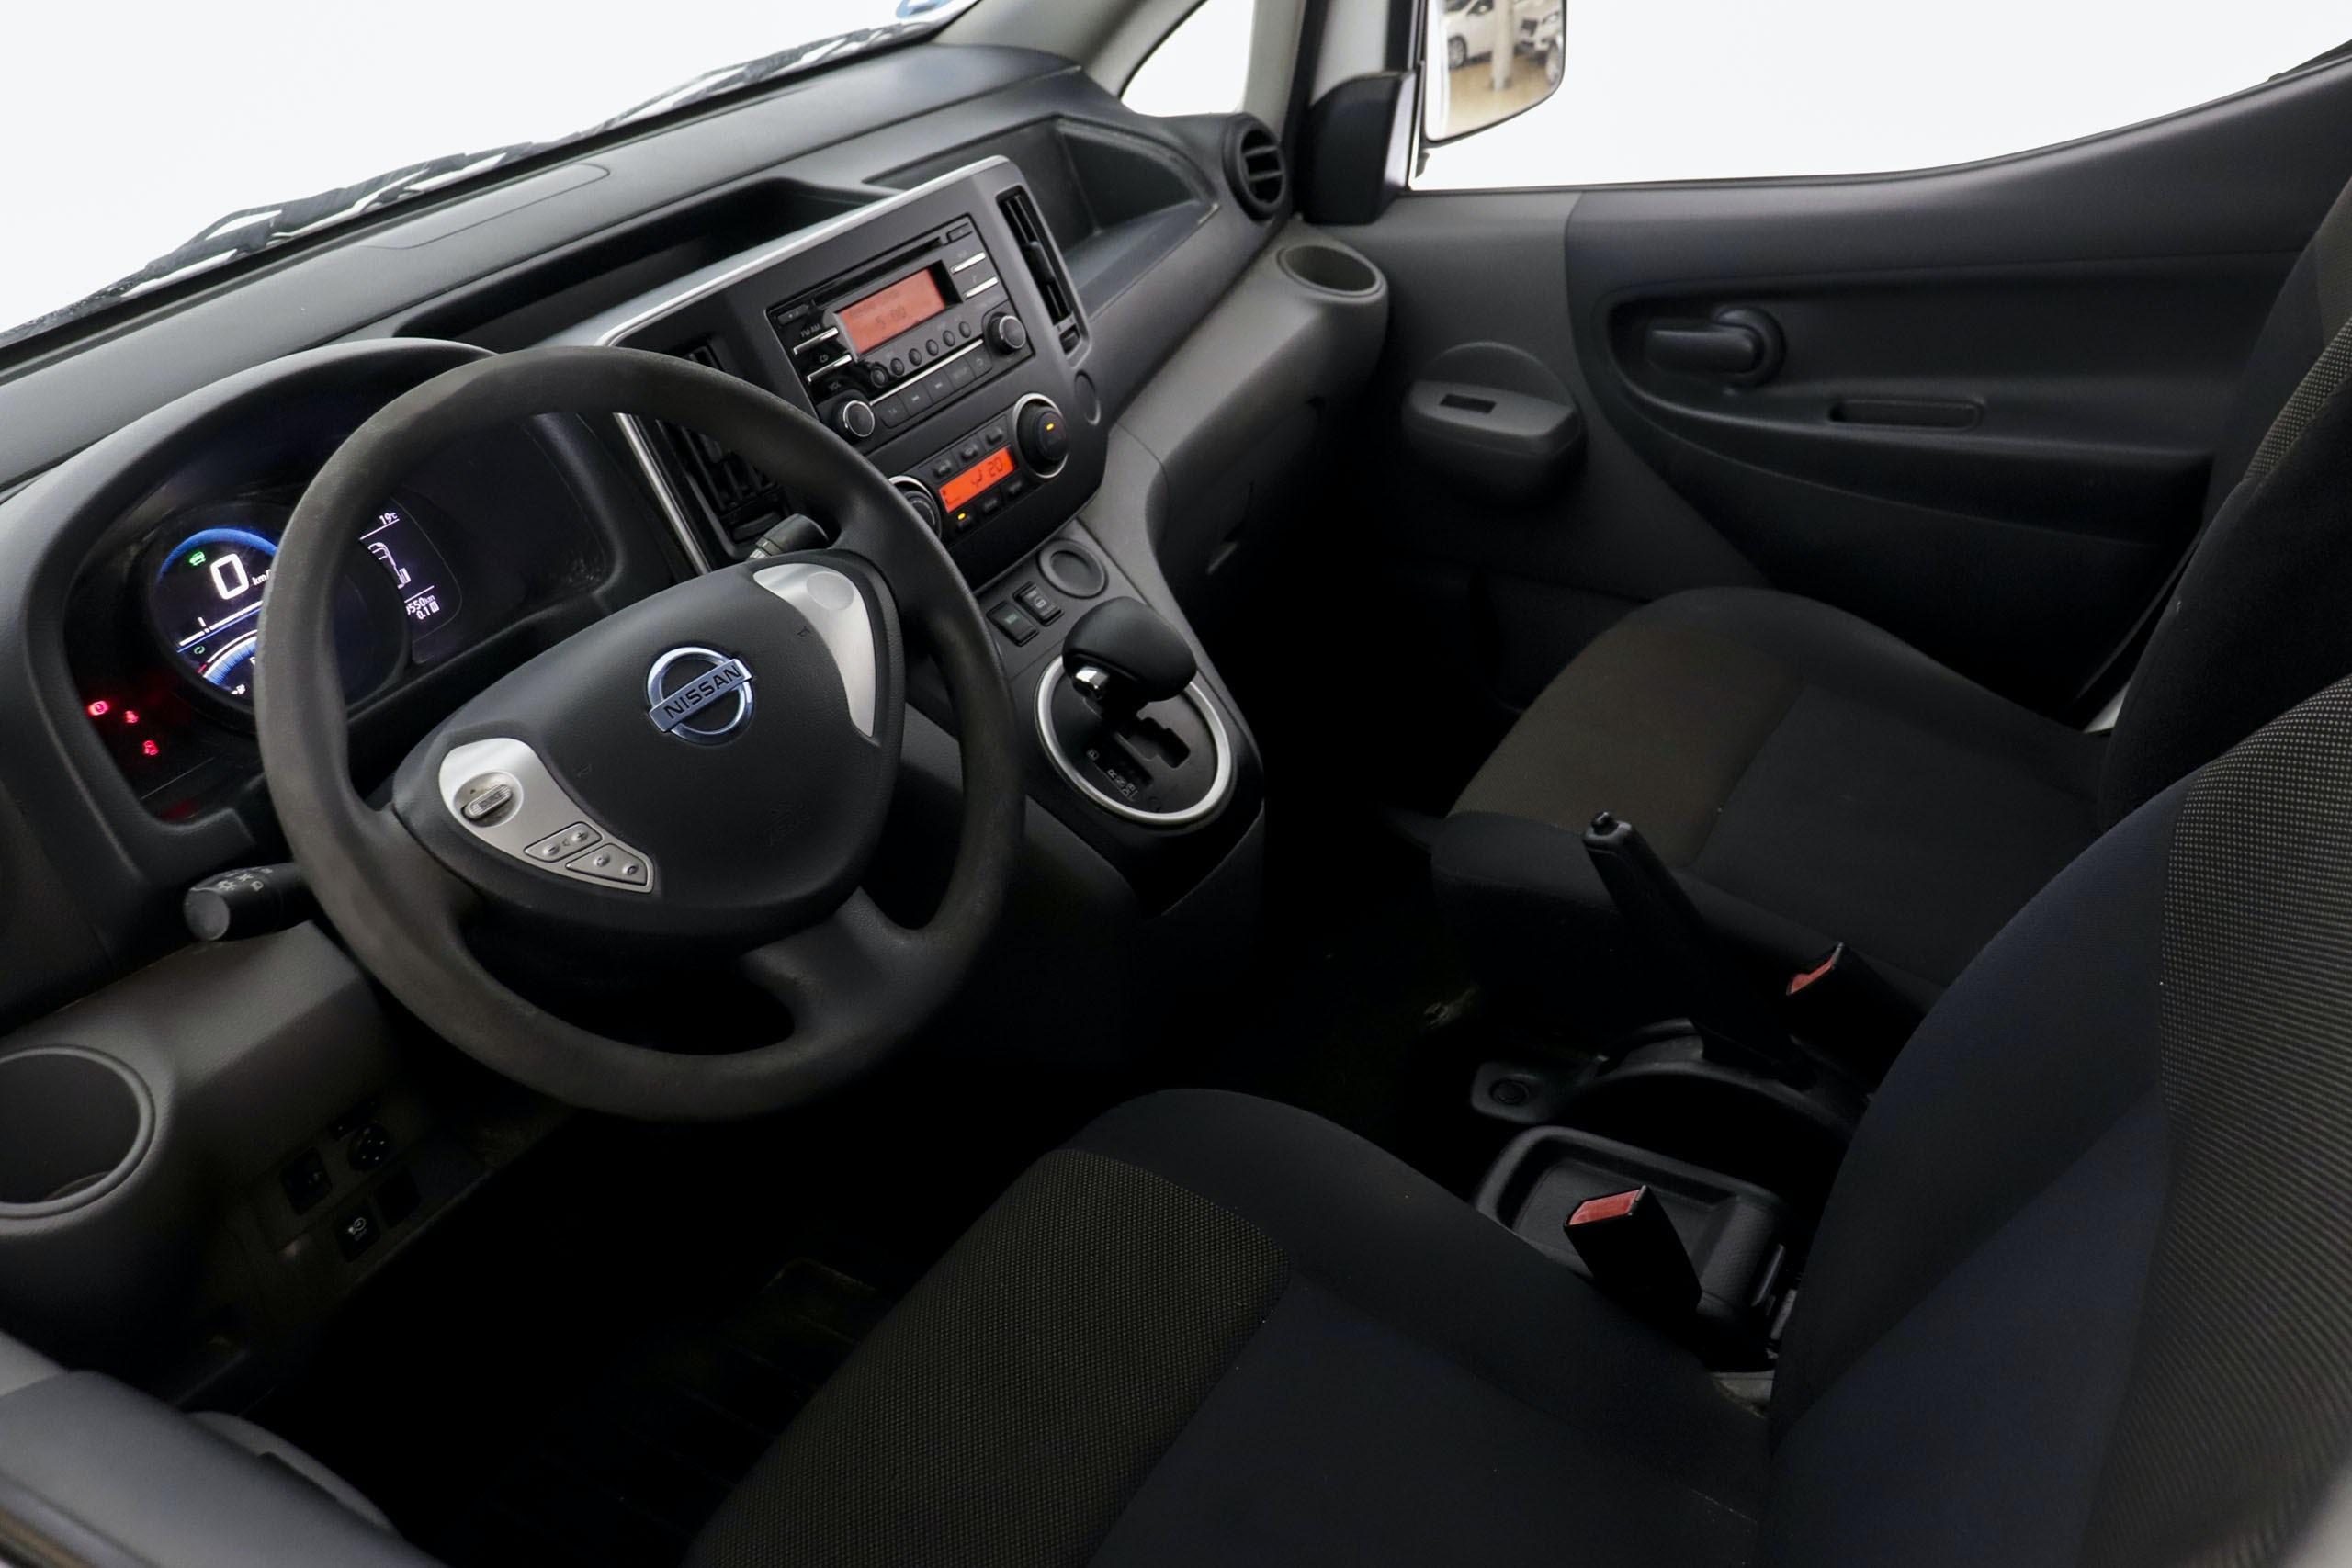 Nissan E-nv200 Combi5 110cv 5p Hybrid E5 Auto - Foto 19